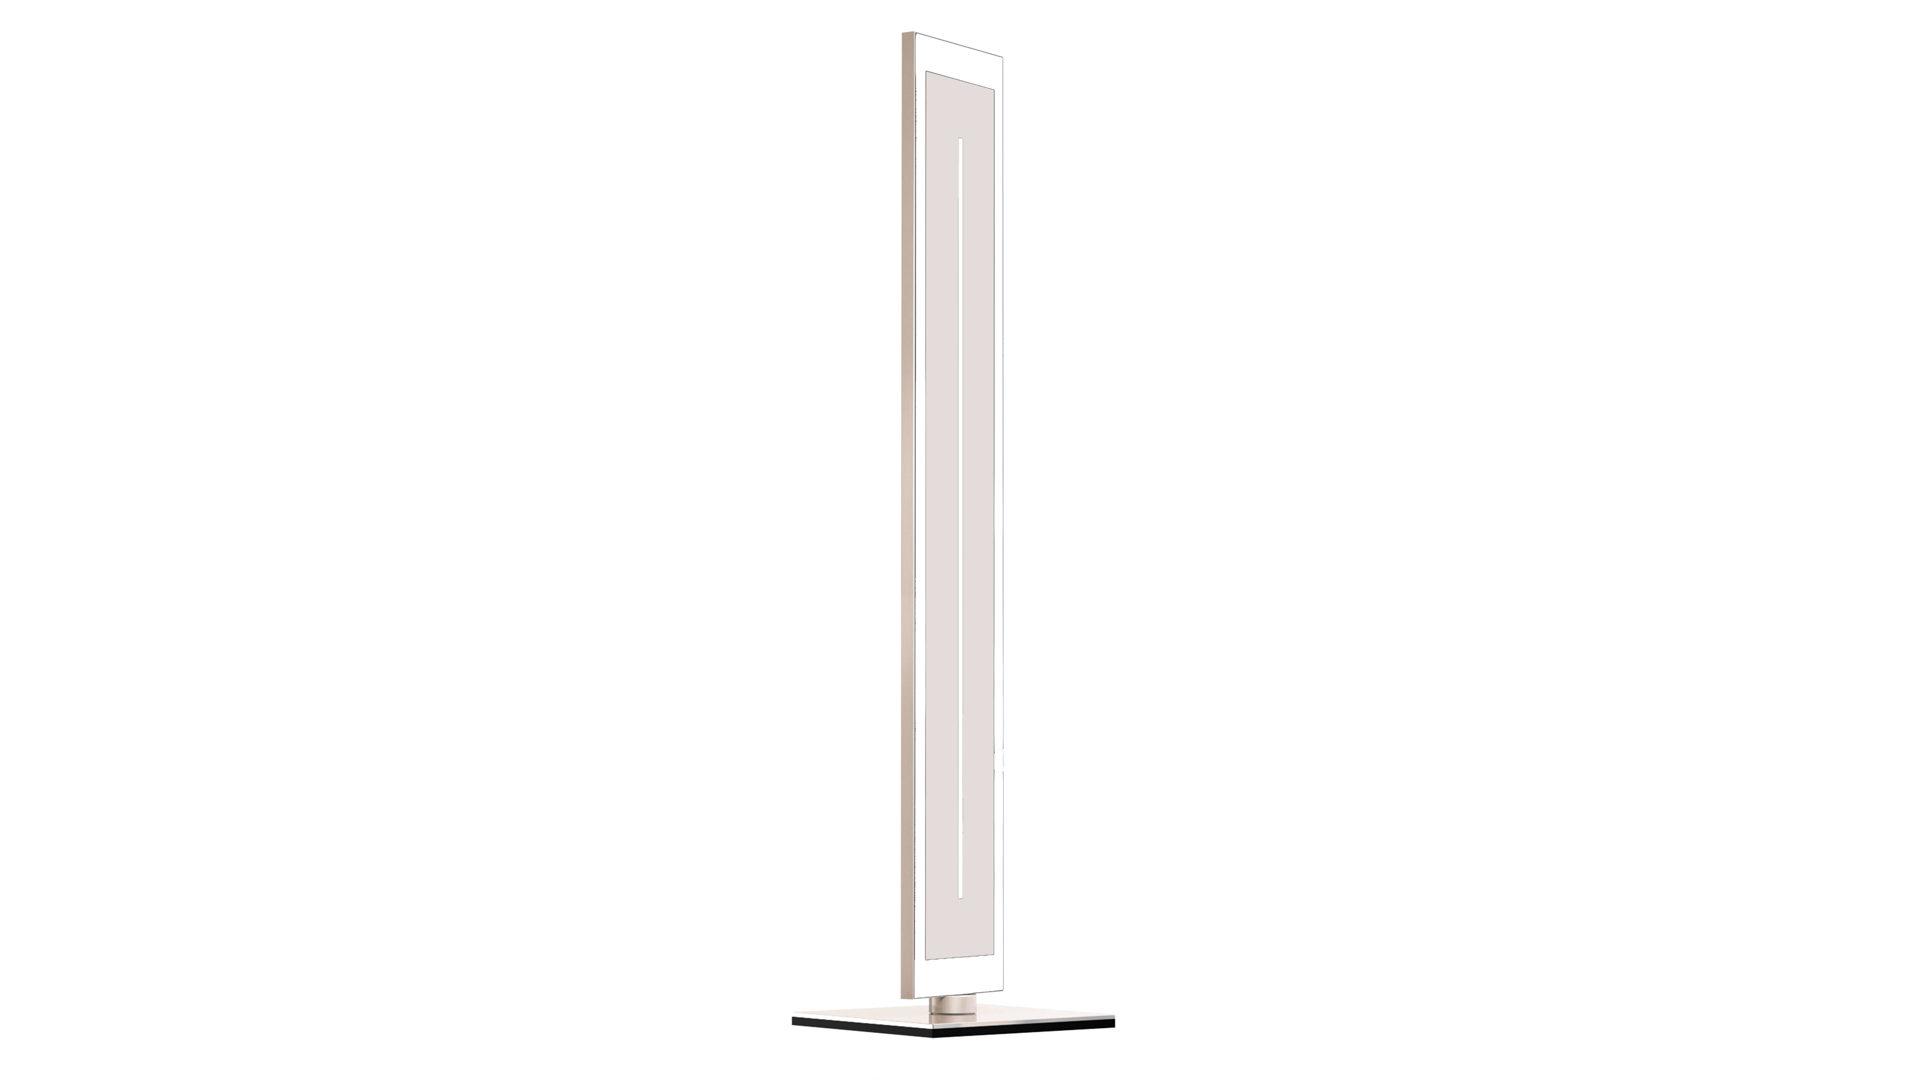 EVOTEC LED Stehleuchte, Aluminium U0026 Nickel Gebürstet, Weißes Glas   Ca.  113, Bad Homburg Bei Frankfurt